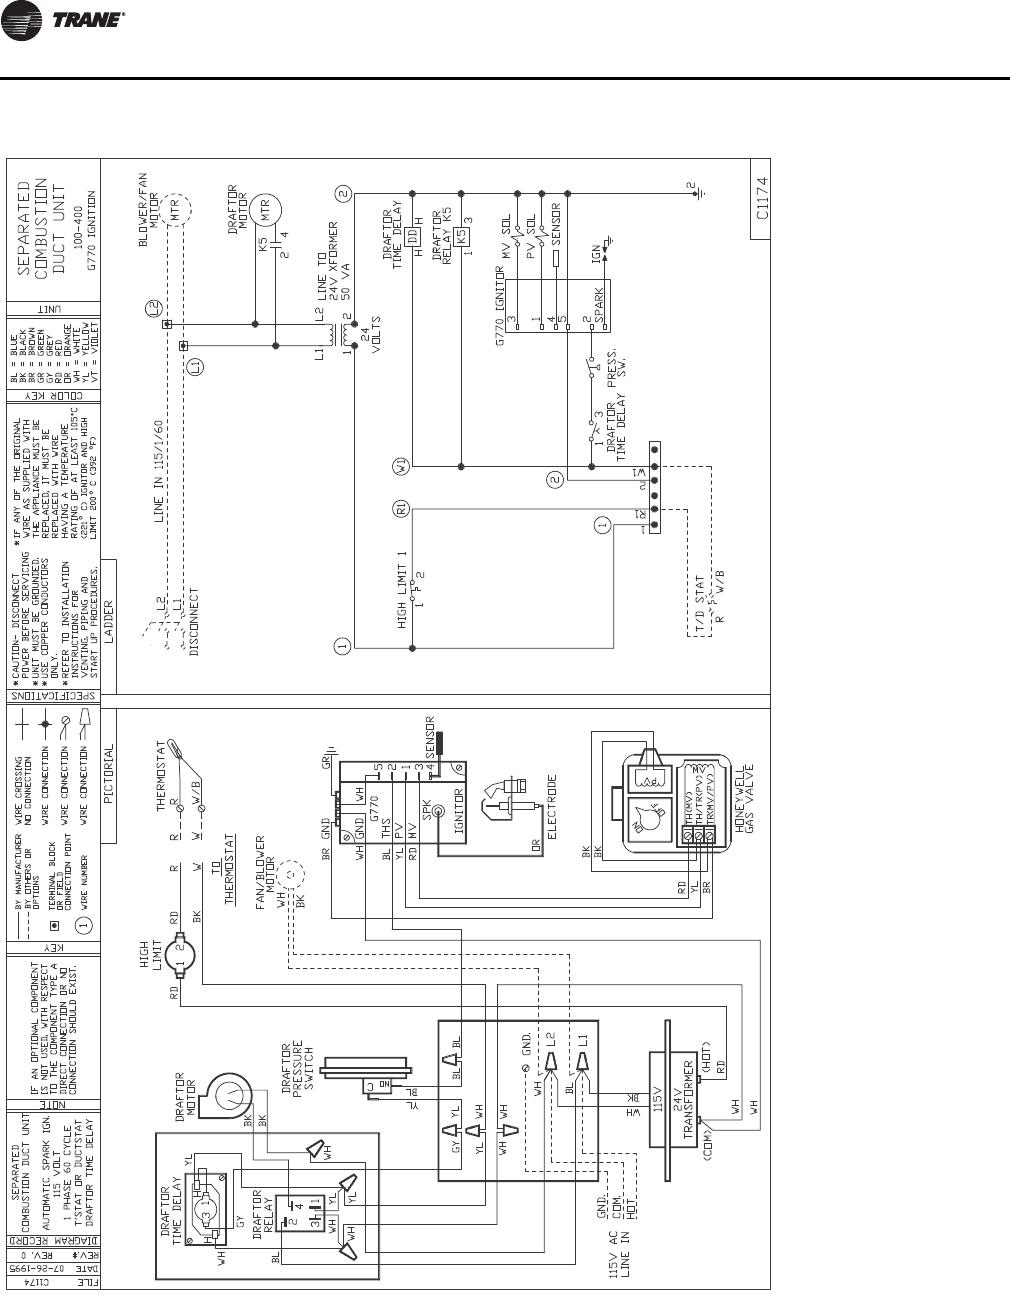 Trane Gas Unit Heaters Installation And Maintenance Manual Gmnd Ac Dpdt Wiring Diagram Ladder Diagrams